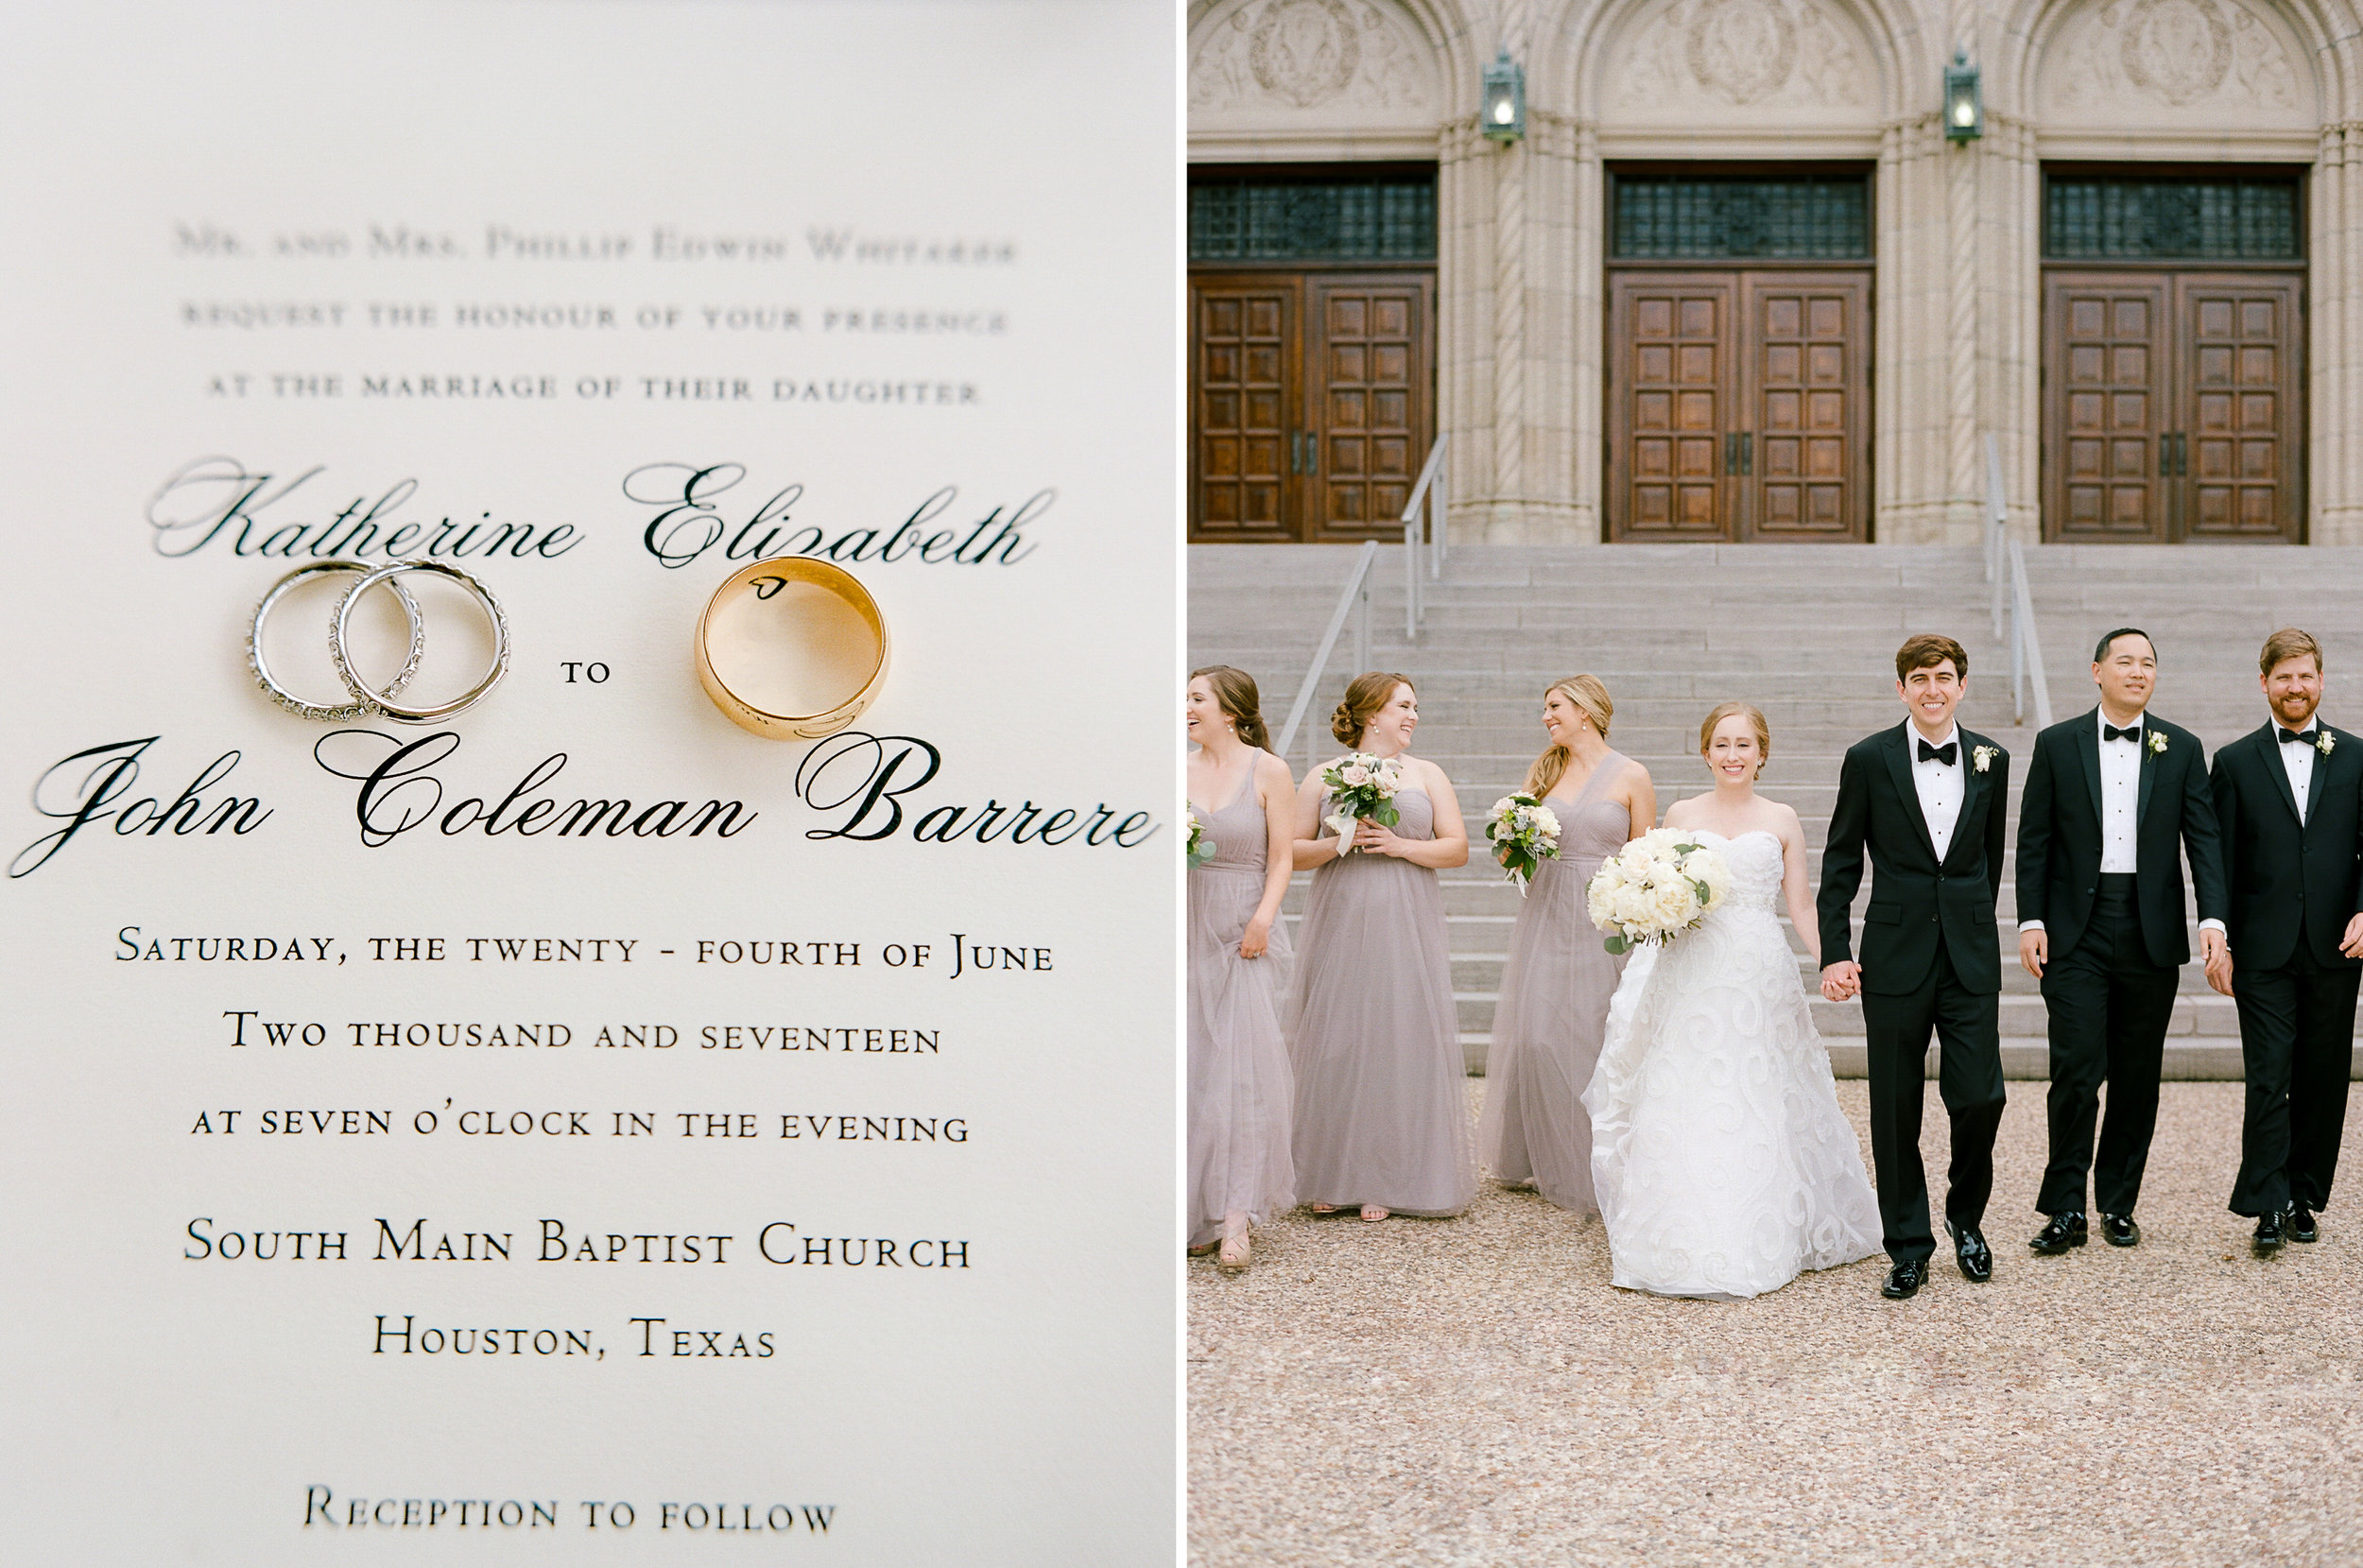 Fine-Art-Film-Houston-Wedding-Photographer-Best-Top-Luxury-Texas-Austin-Dallas-Destination-Dana-Fernandez-Photography-River-Oaks-Country-Club-South-Main-Baptist-Ceremony-Reception-Wedding-129.jpg